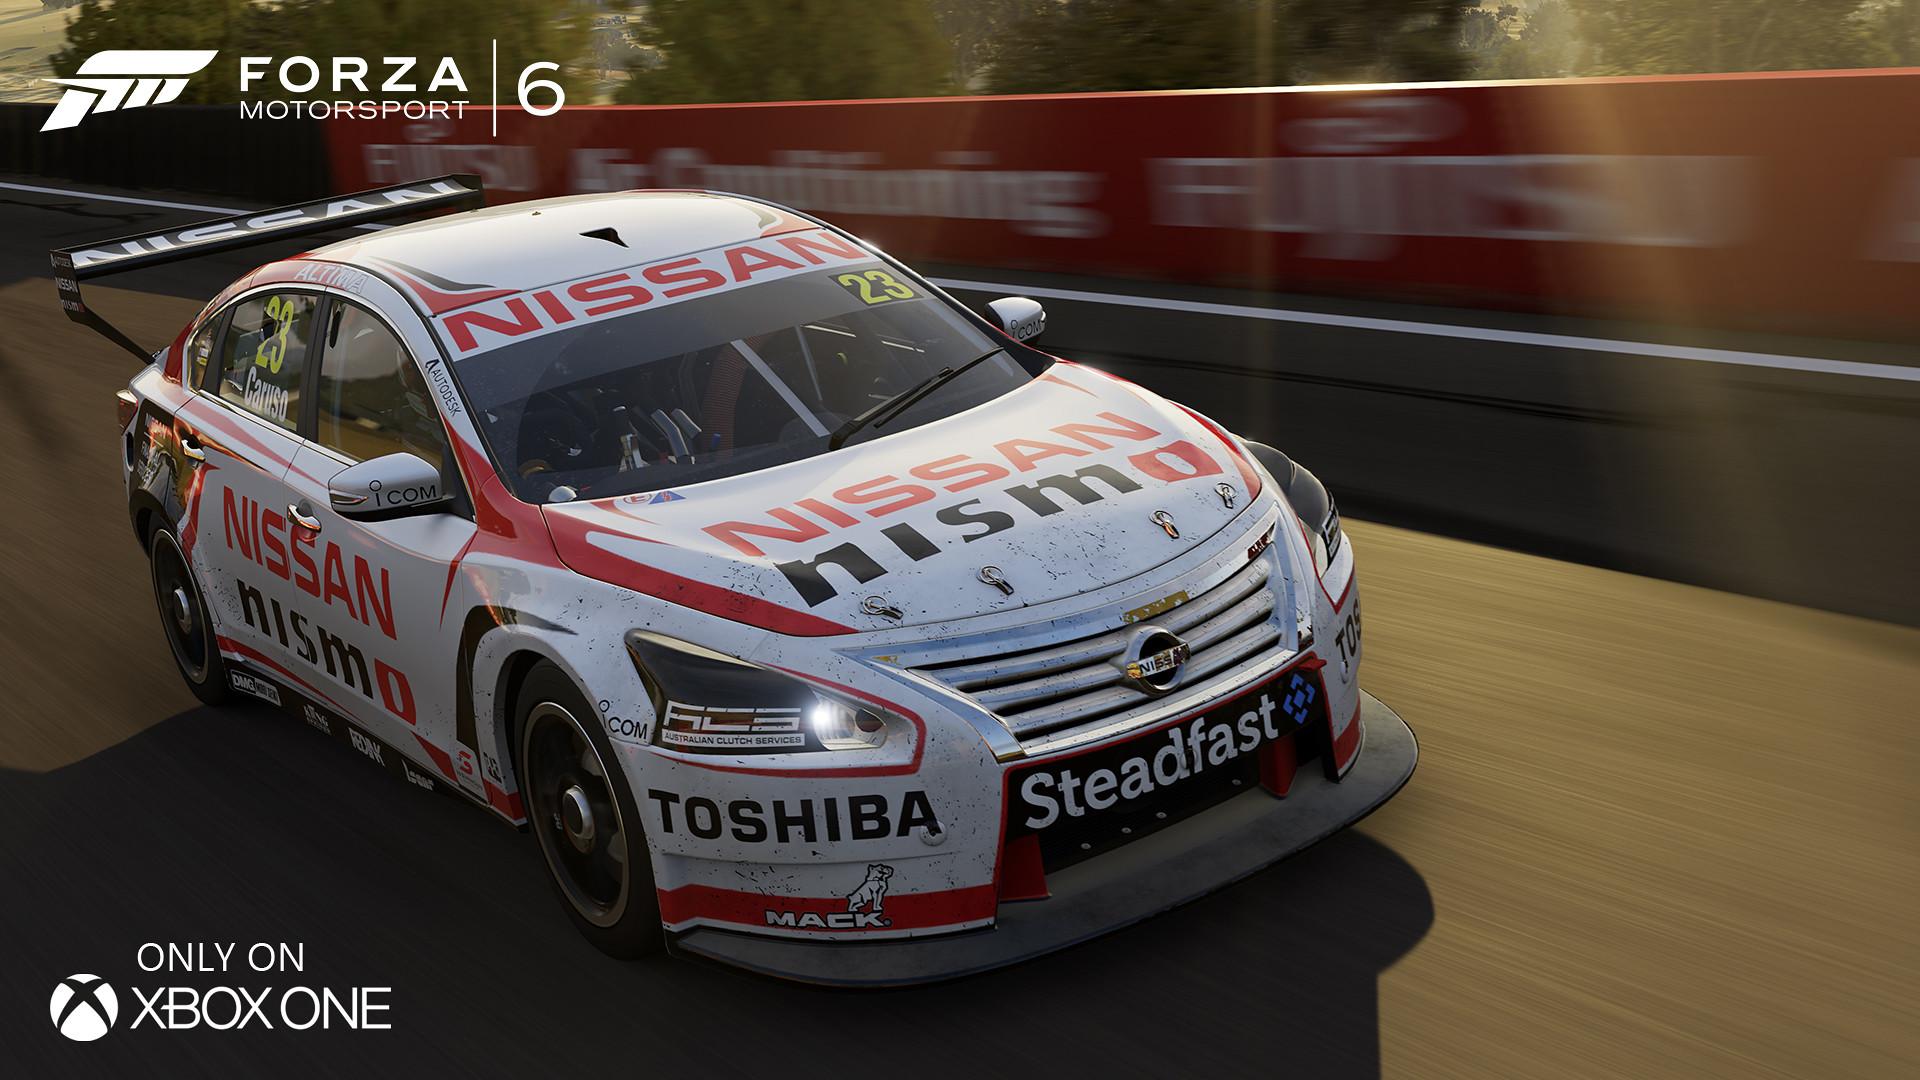 V8Supercars_Nissan_23_Altima_WM_Forza6